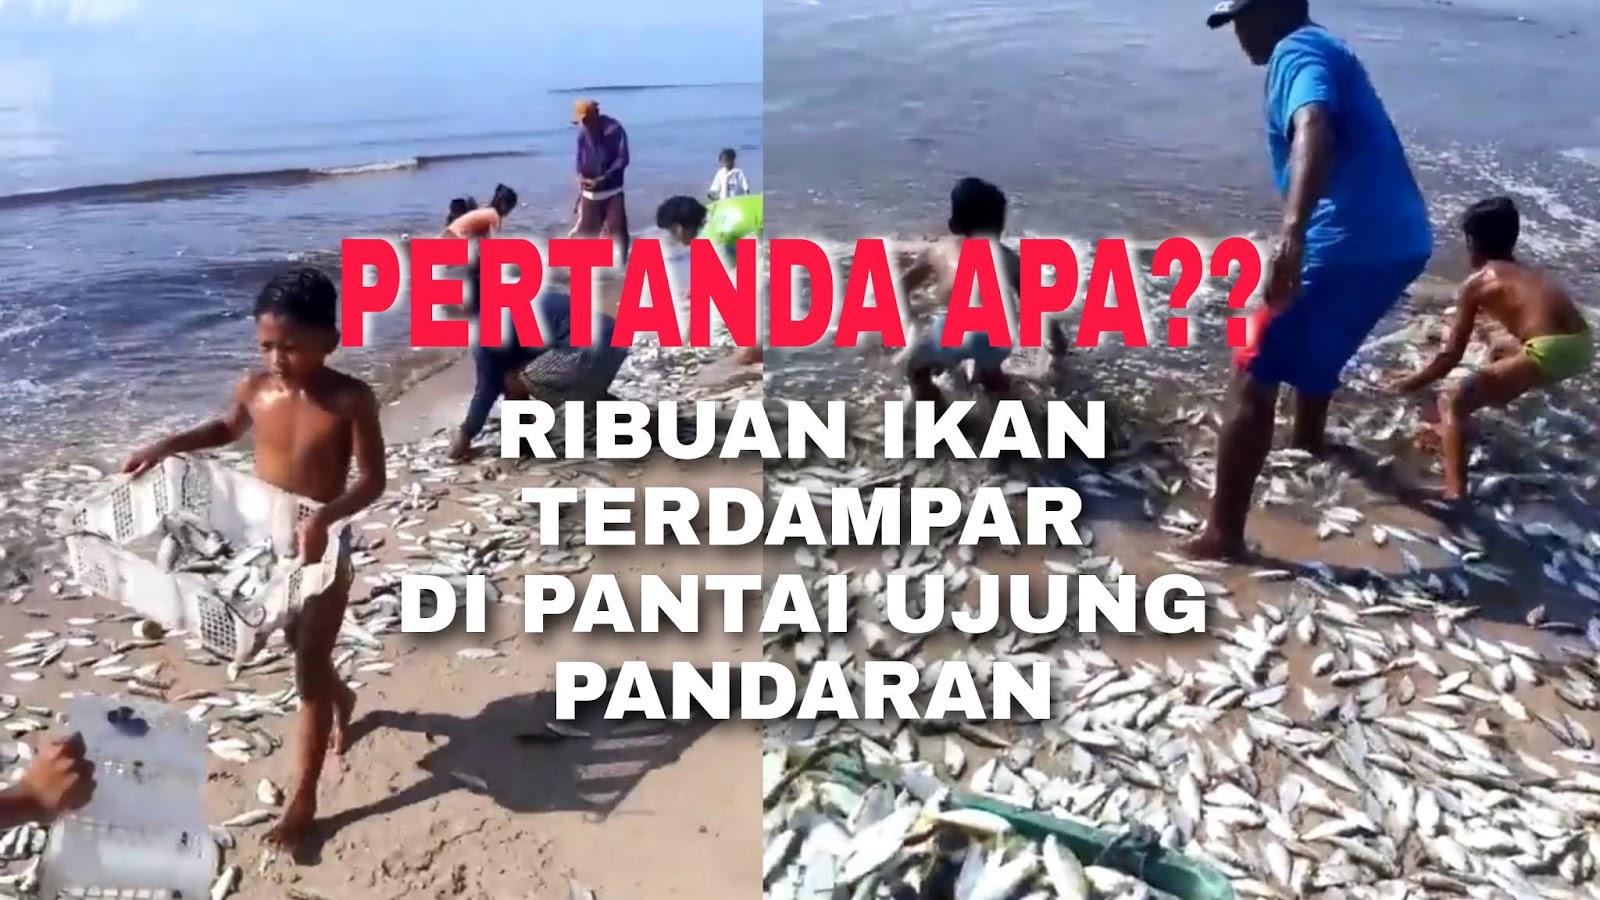 ikan terdampar, sampit, nelayan sampit, ujung pandaran